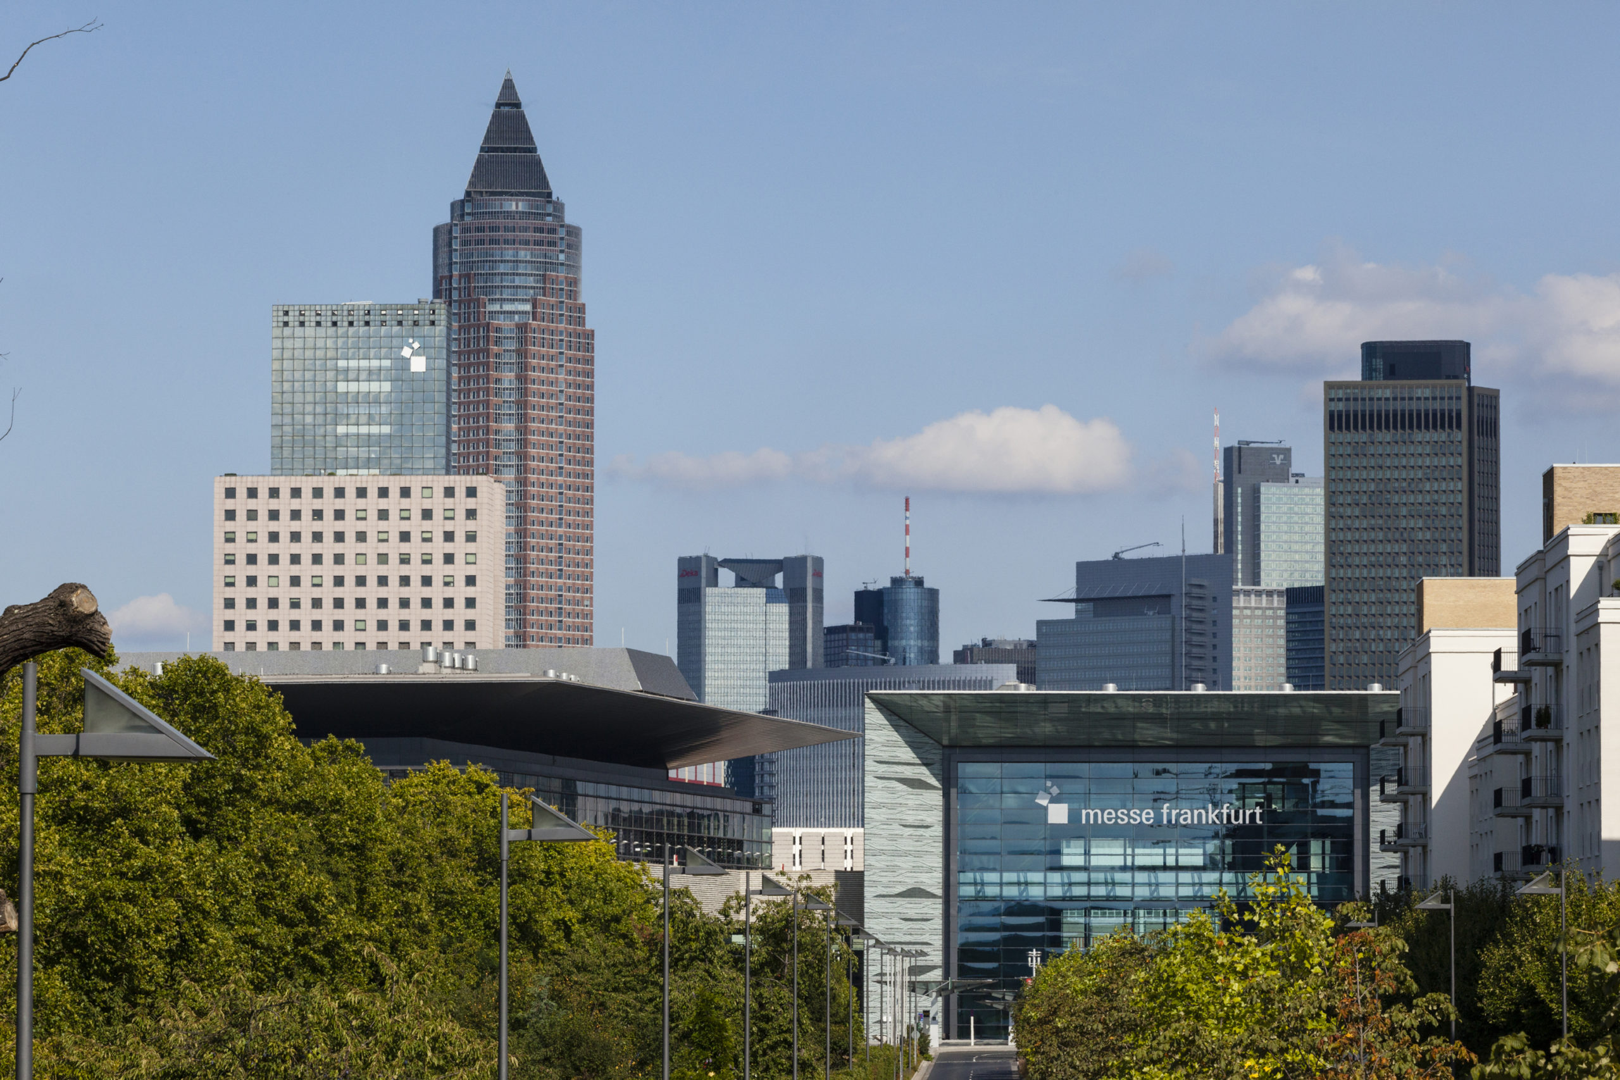 © Messe Frankfurt